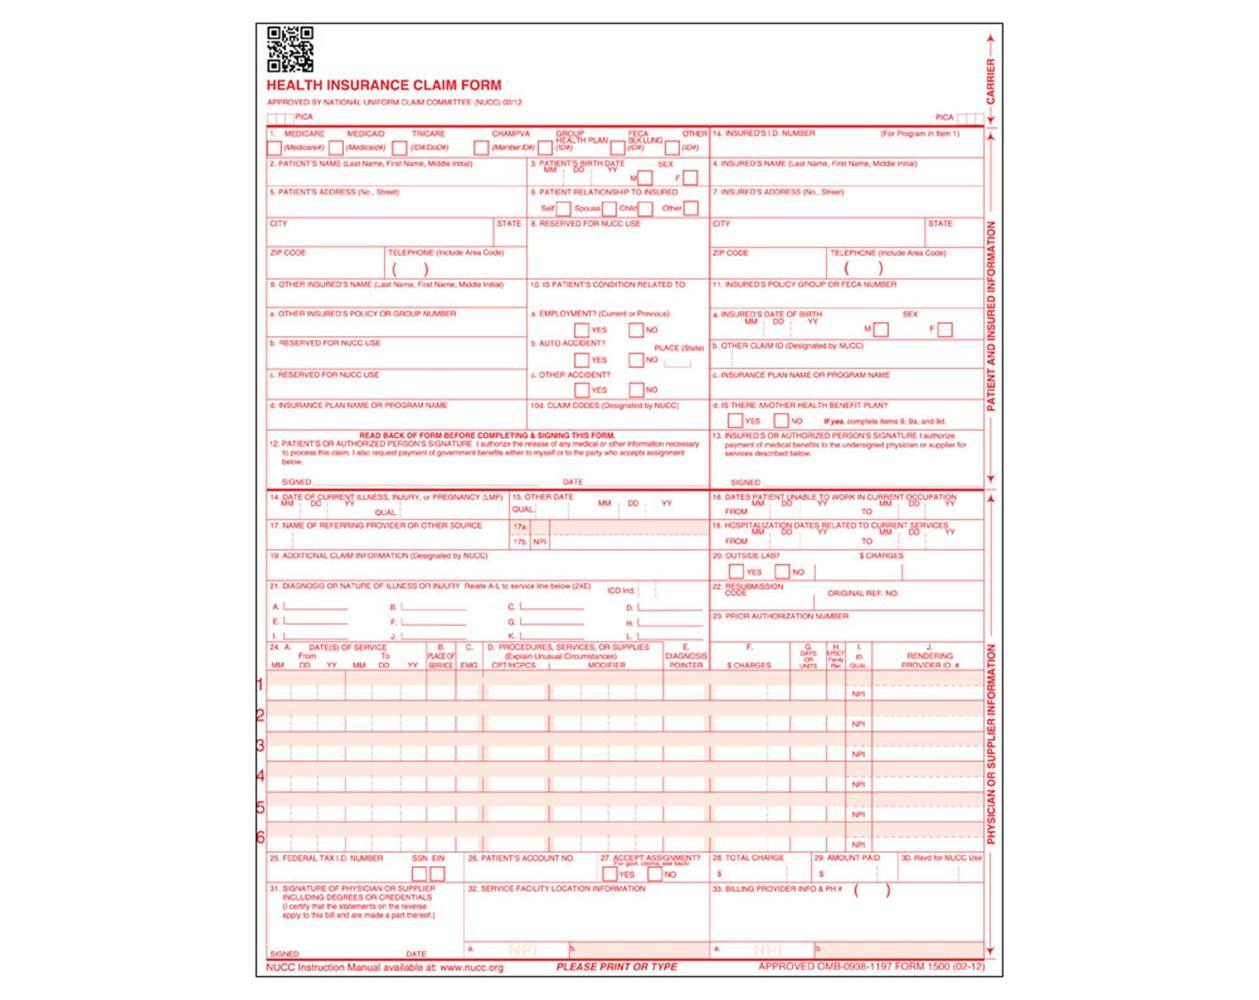 Hcfa 1500 Forms